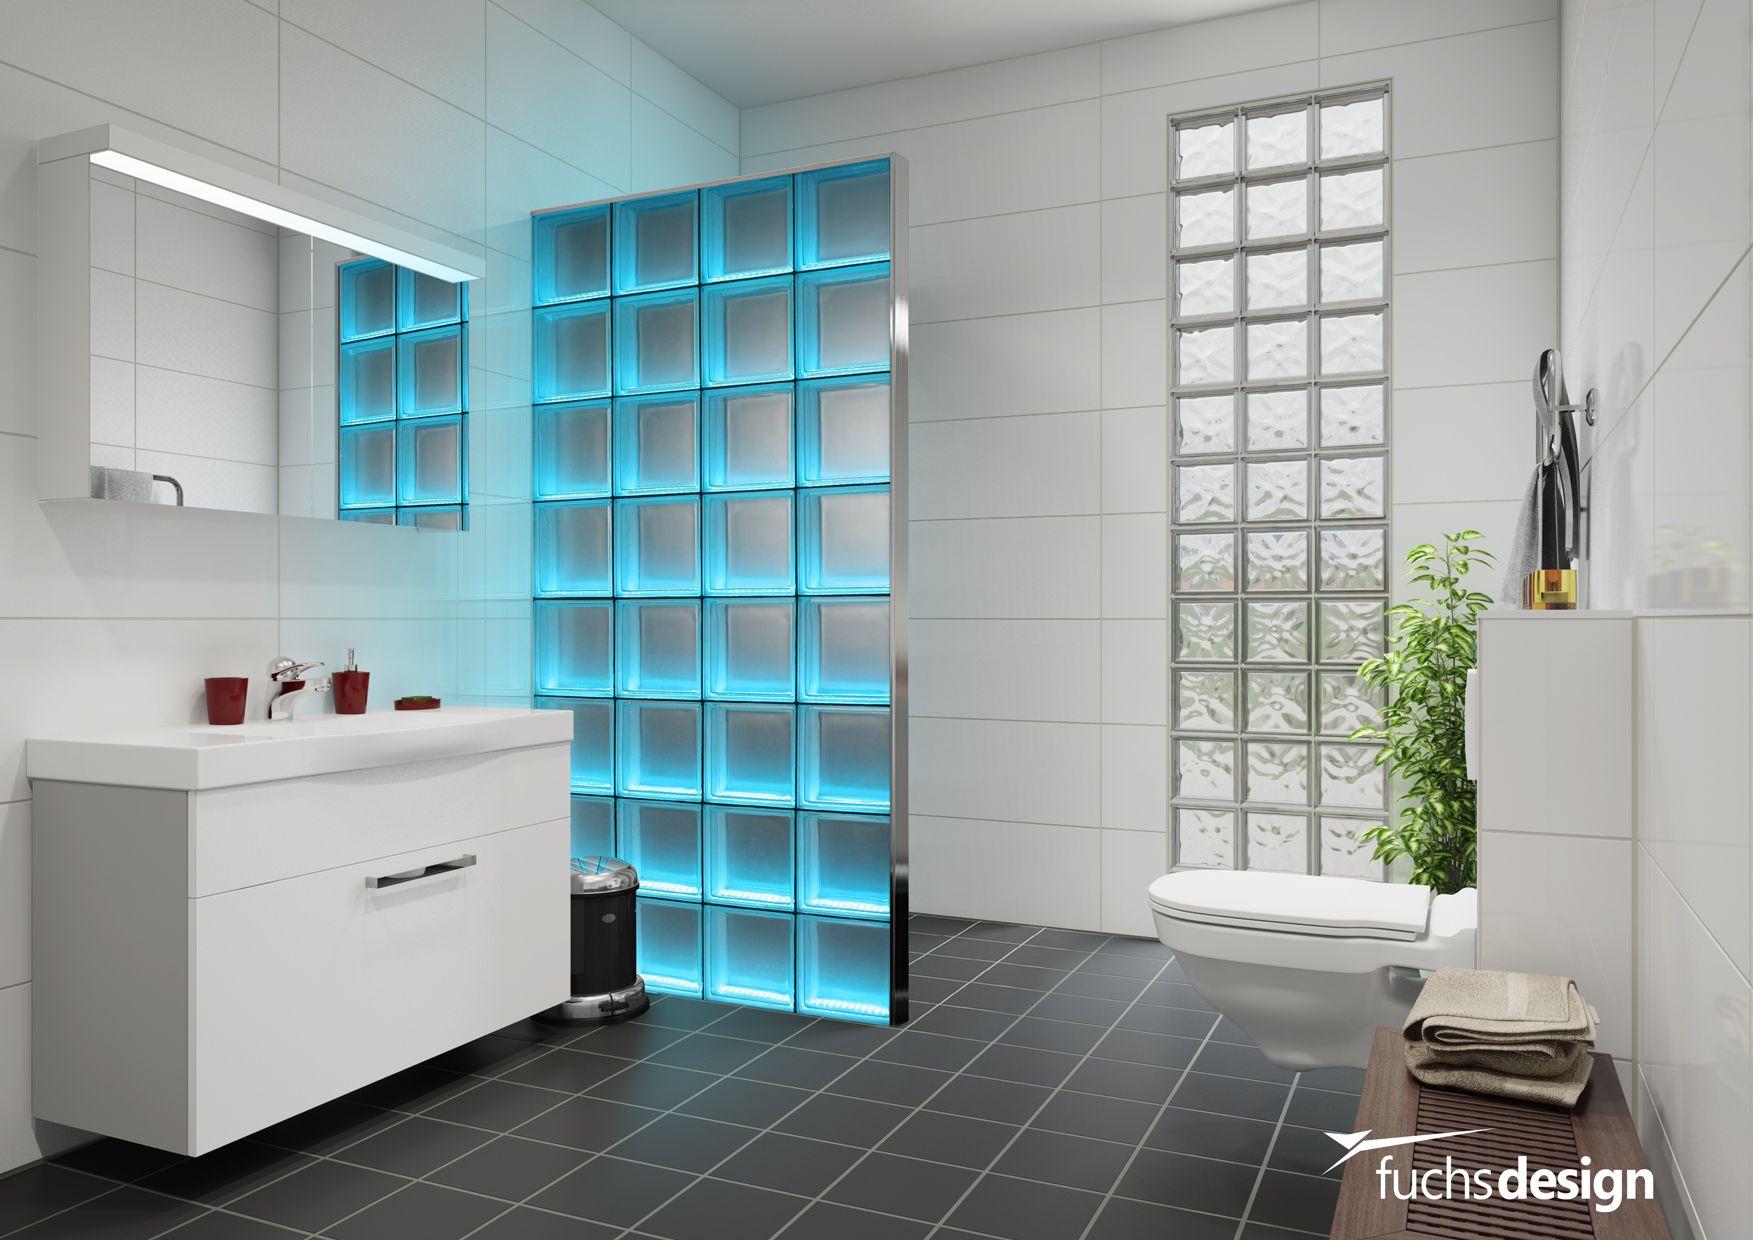 Pin de Fuchs Design GmbH en Glassteinwand /Glasbaustein ...